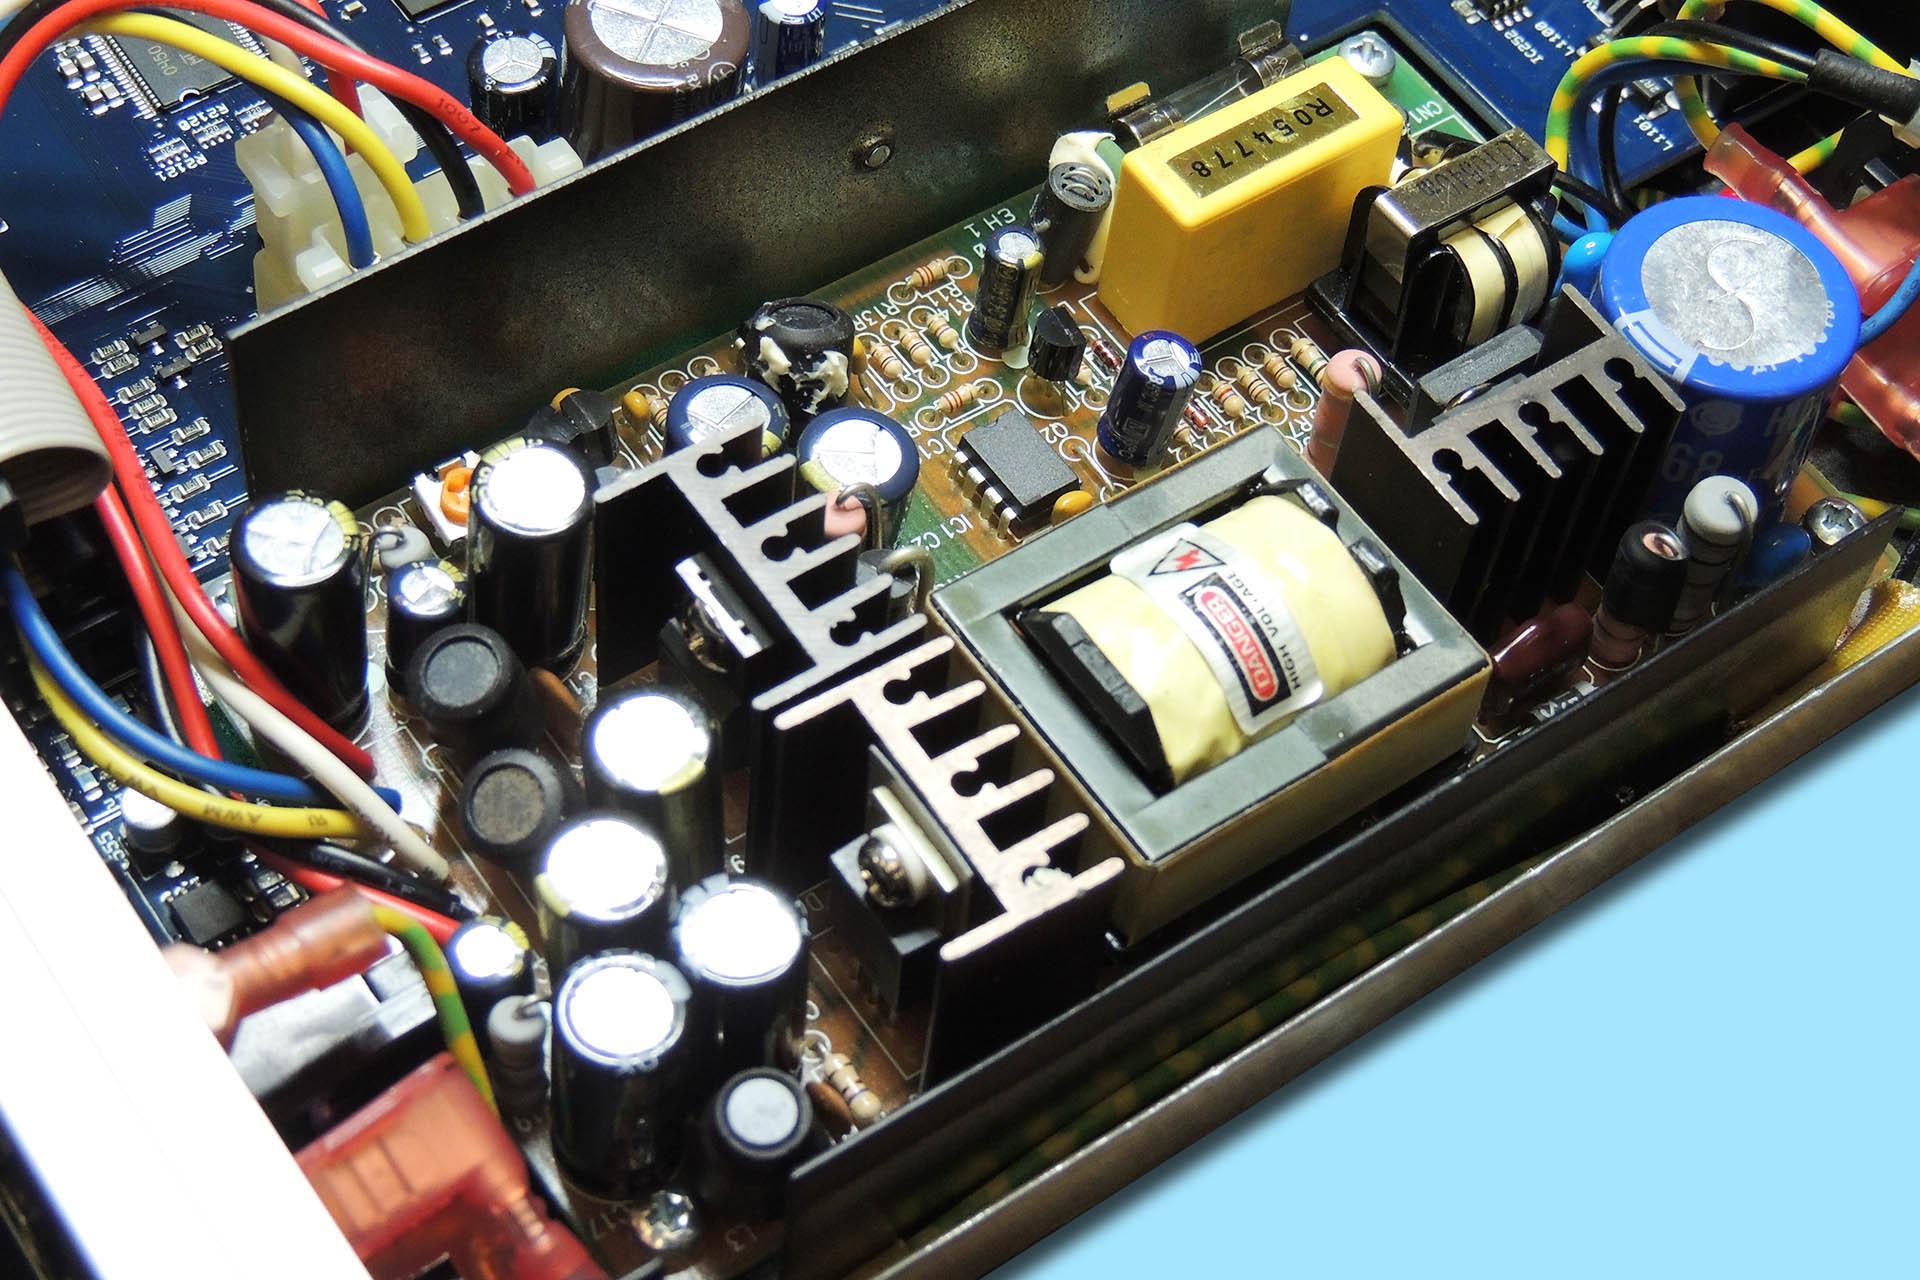 Fireface 800 Power Supply repair at Plasma Music - audio repairs in Hertfordshire